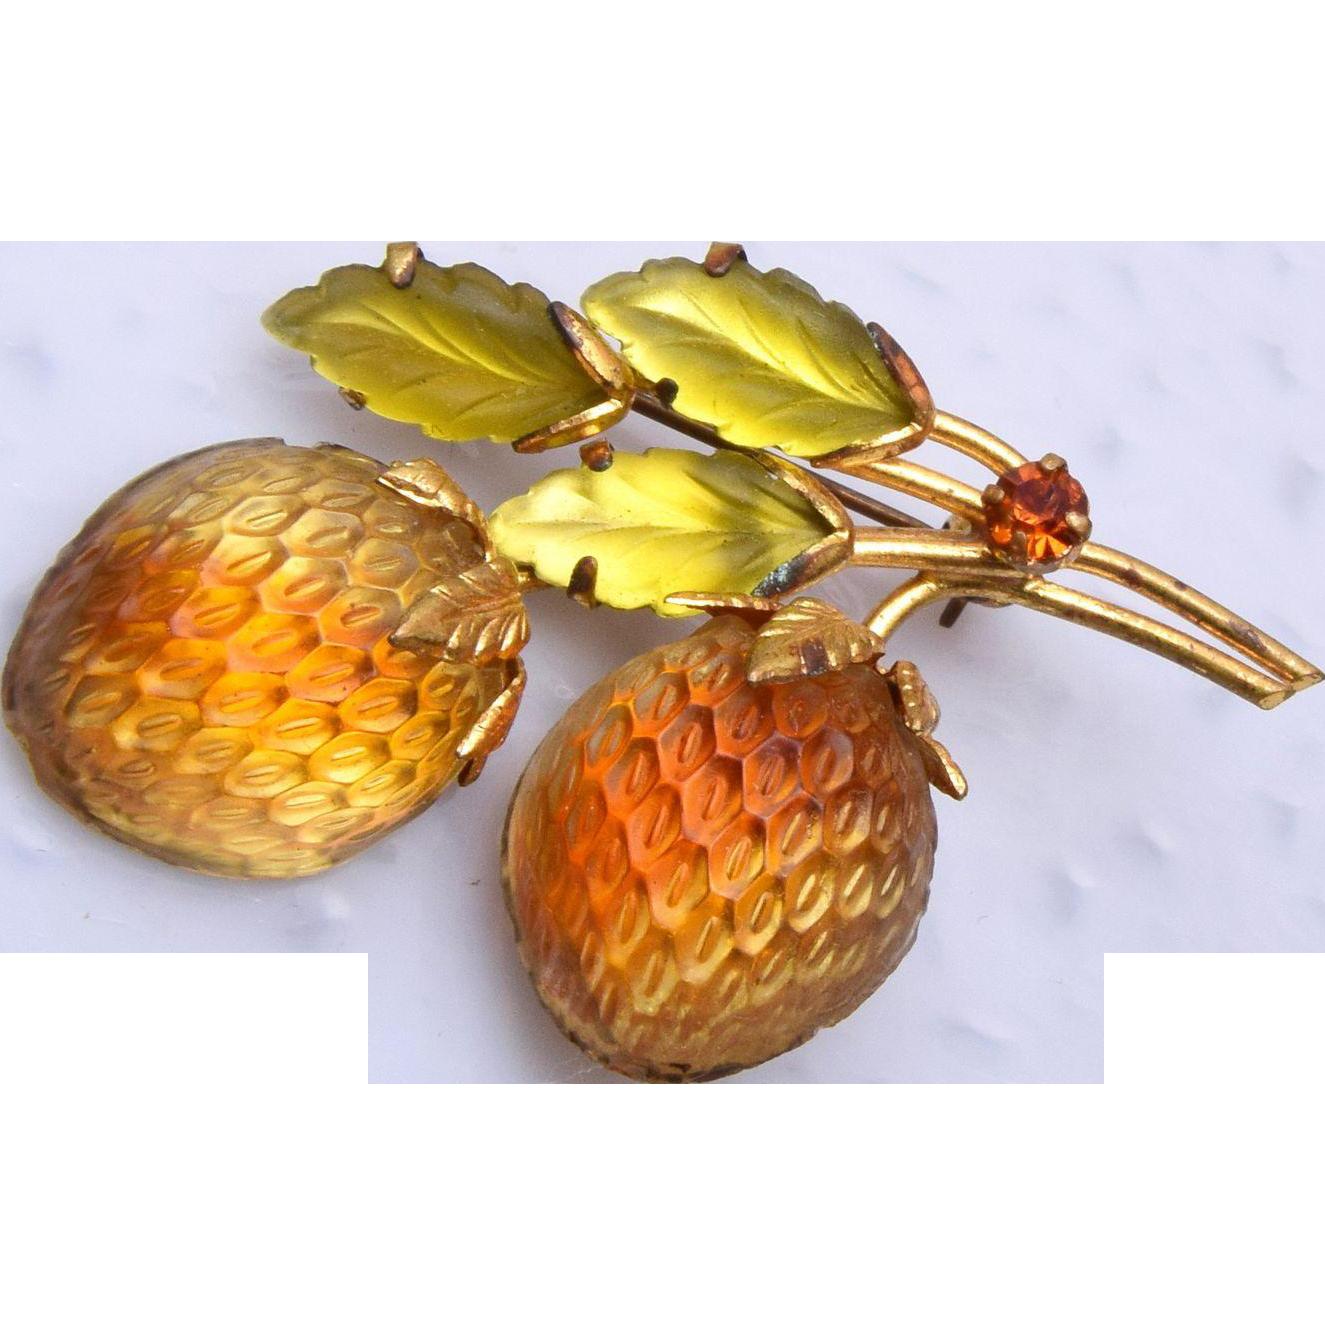 Austria Glowing Golden Strawberry Brooch